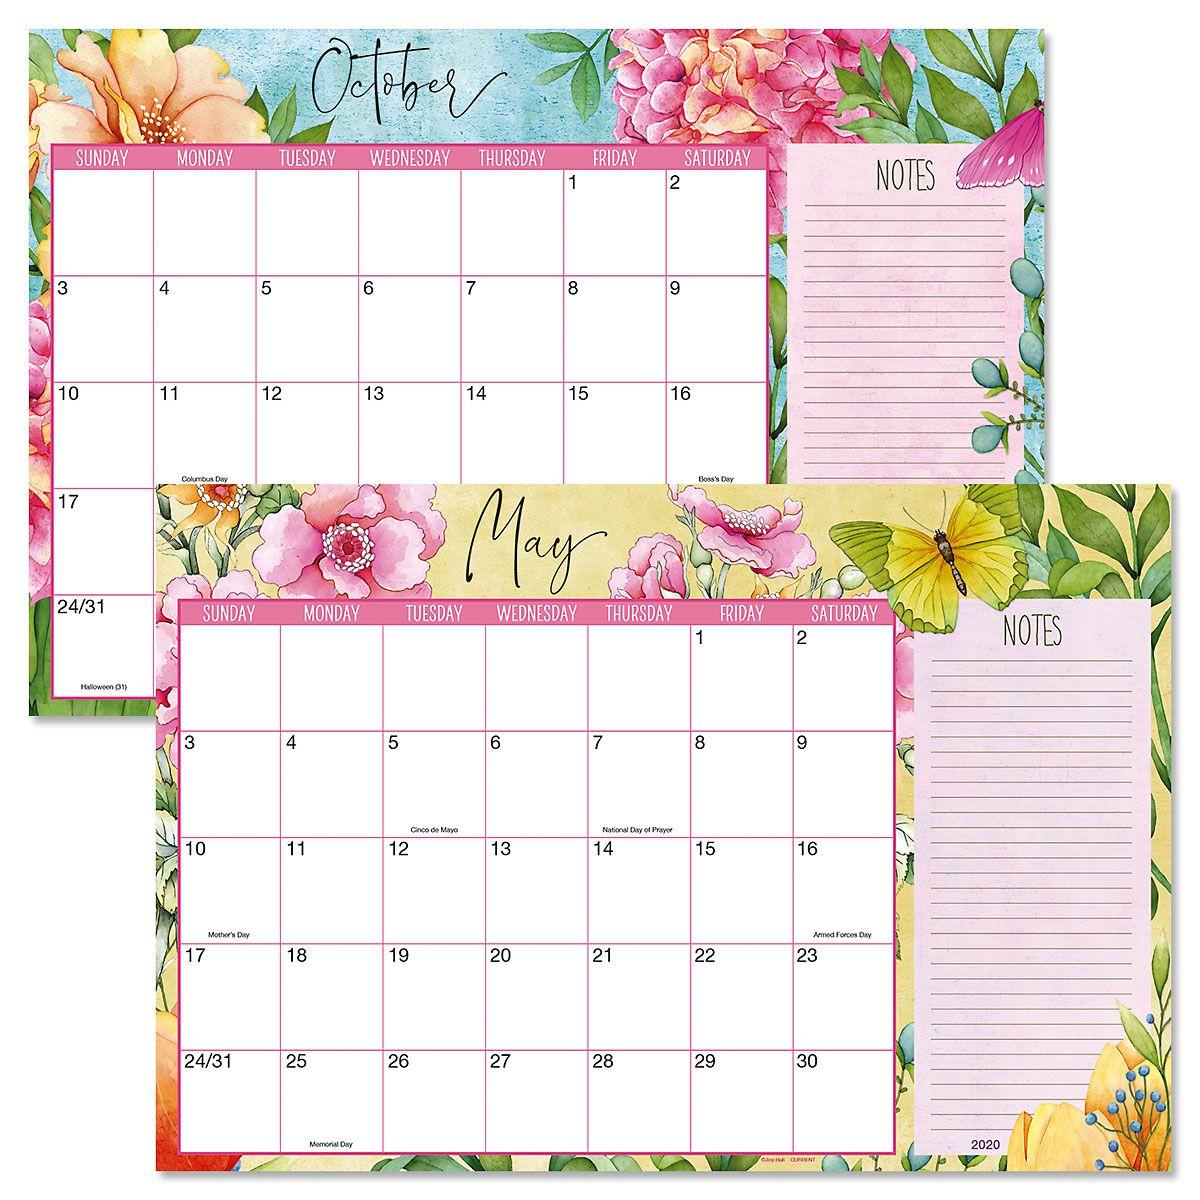 2020-2021 Watercolor Garden Calendar Pad